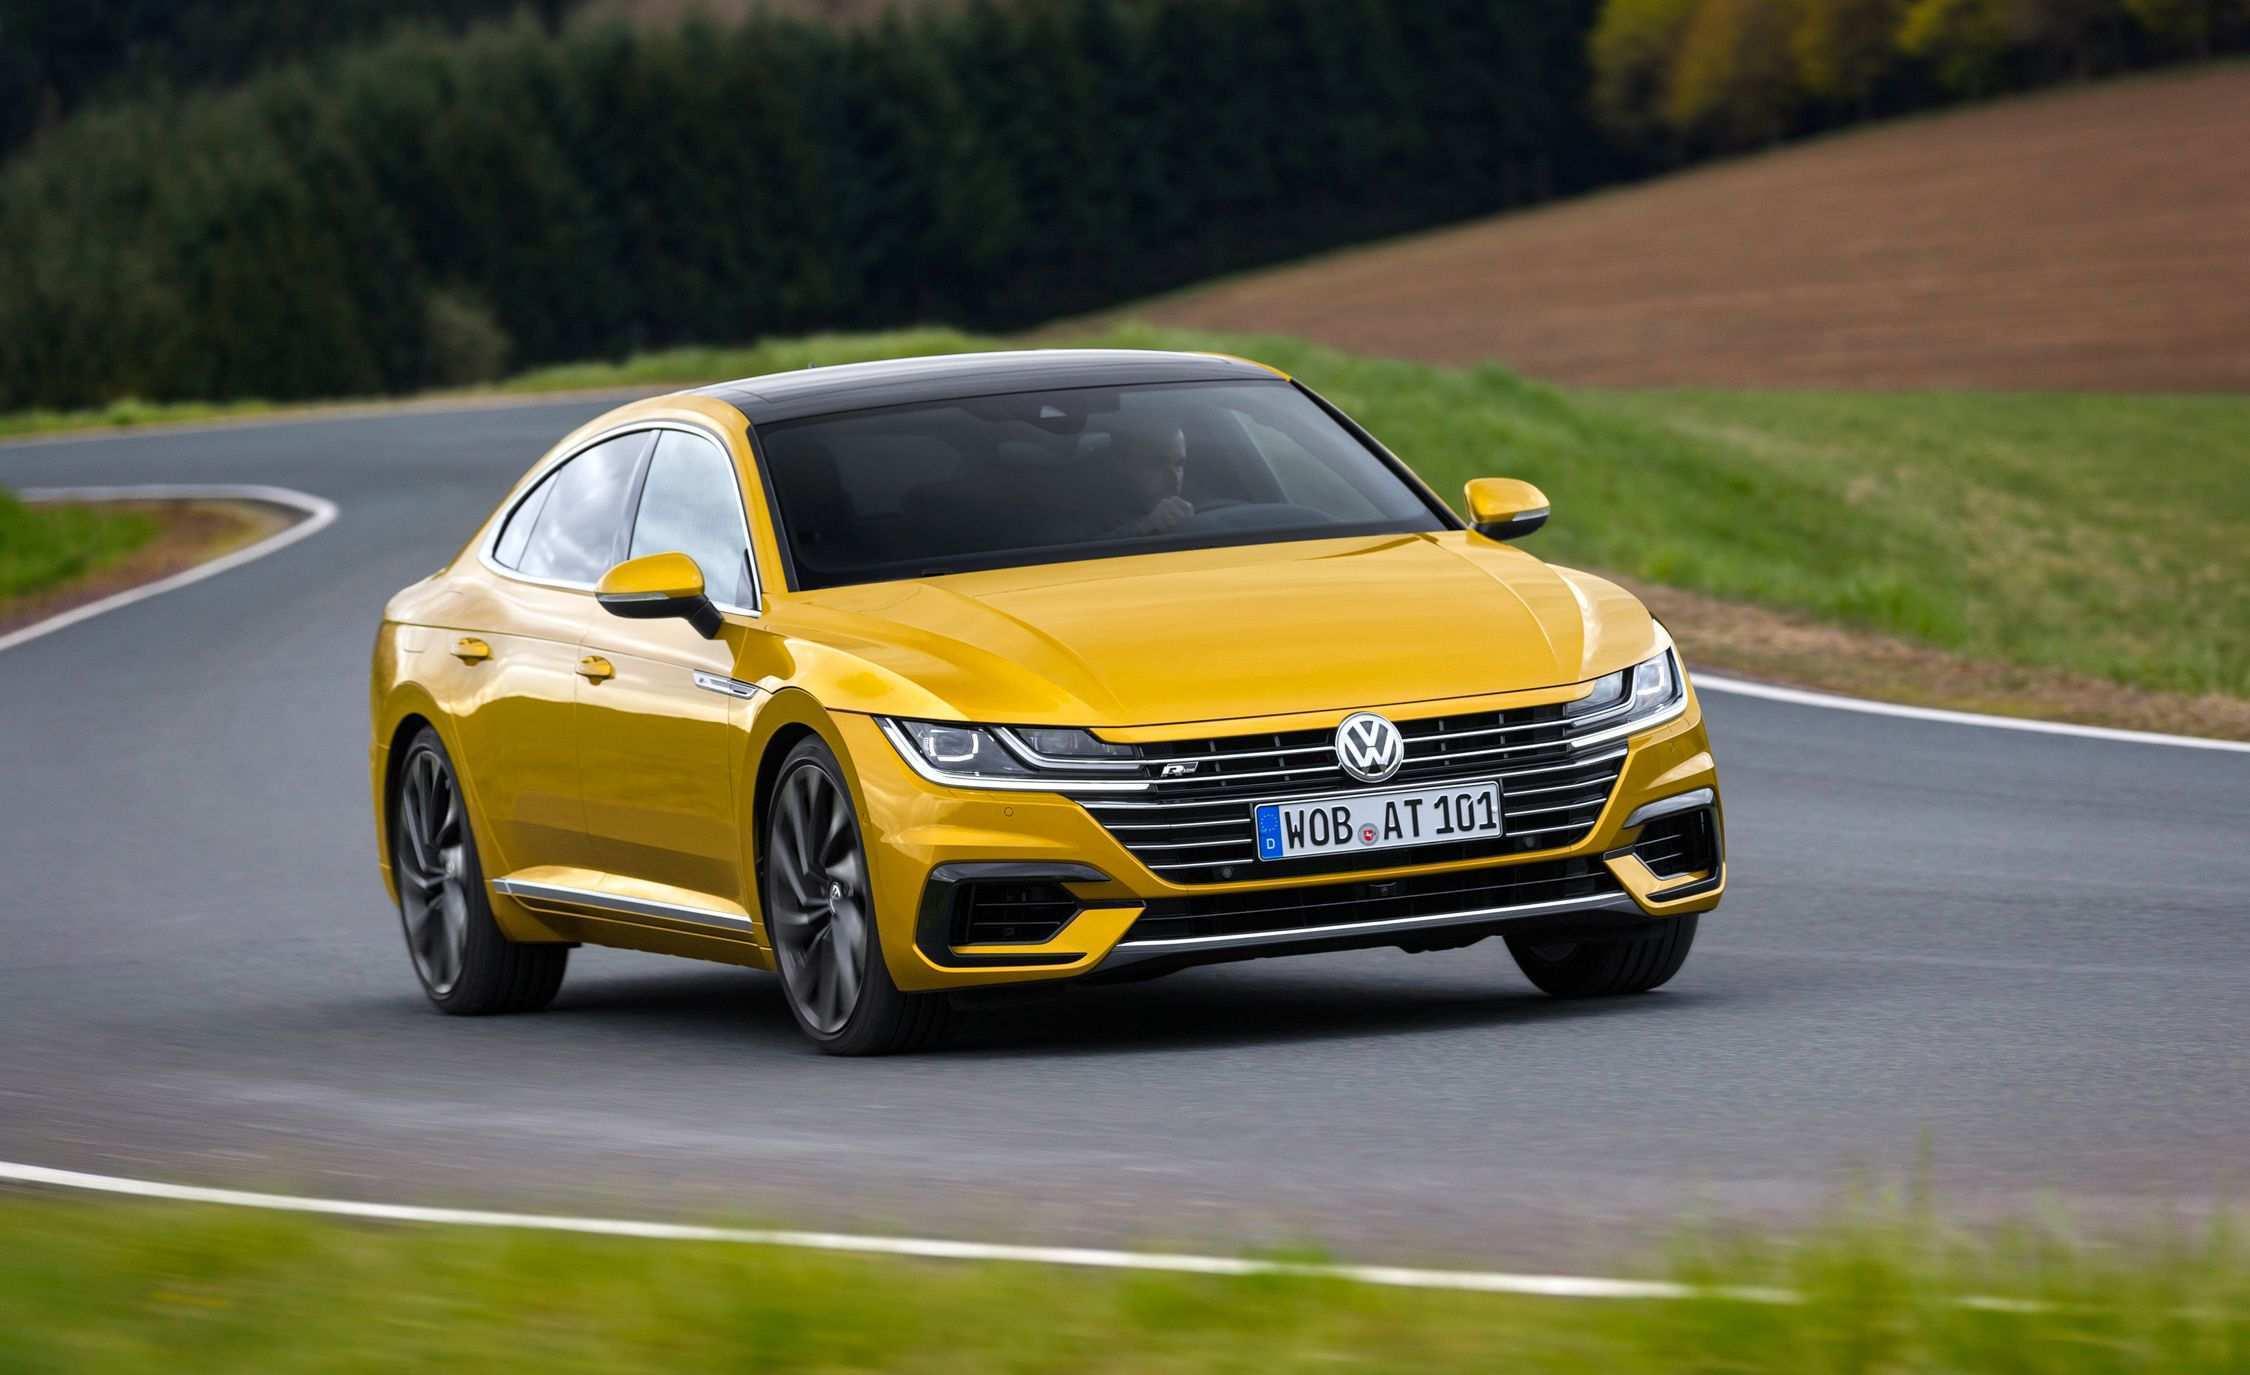 77 New Volkswagen Lancamento 2019 Price Specs for Volkswagen Lancamento 2019 Price